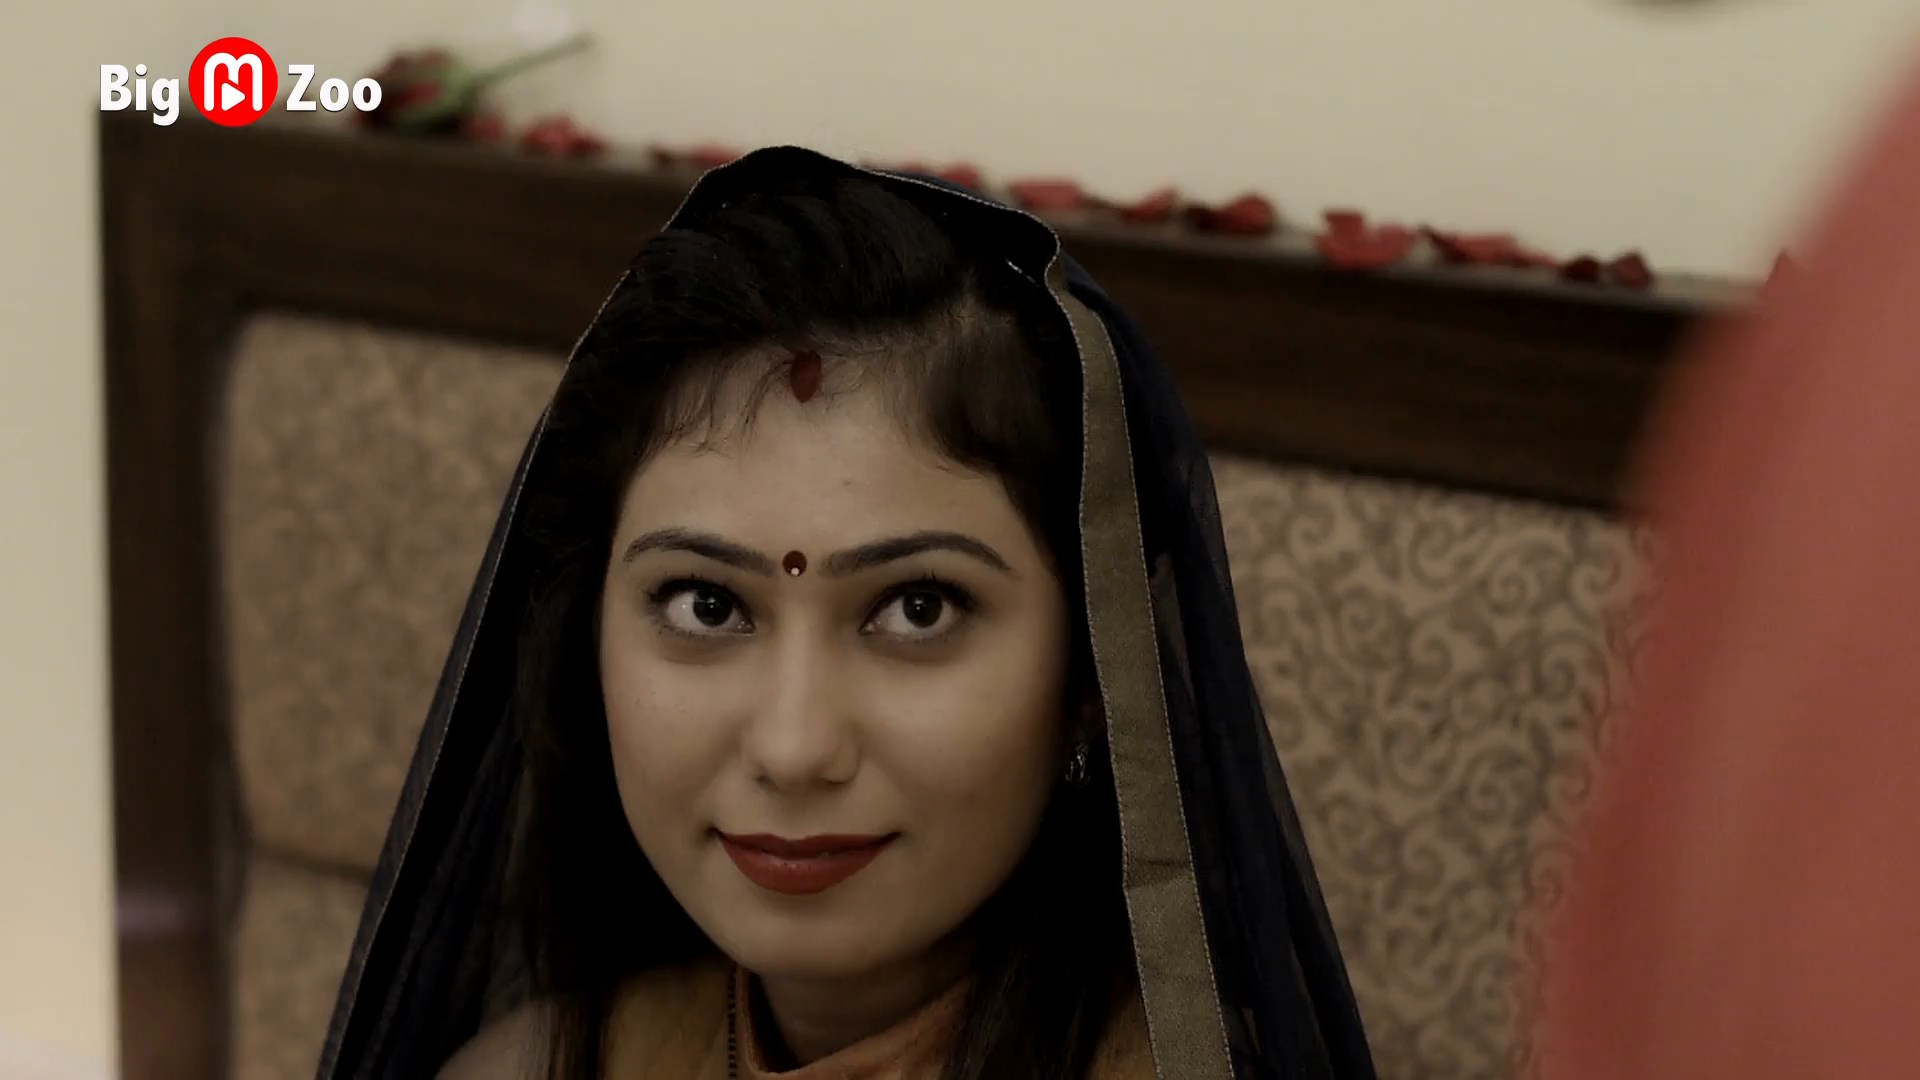 rh 4 - 18+ Rooh 2020 Big Movie Zoo App Originals Hindi Short Film 720p HDRip 70MB x264 AAC